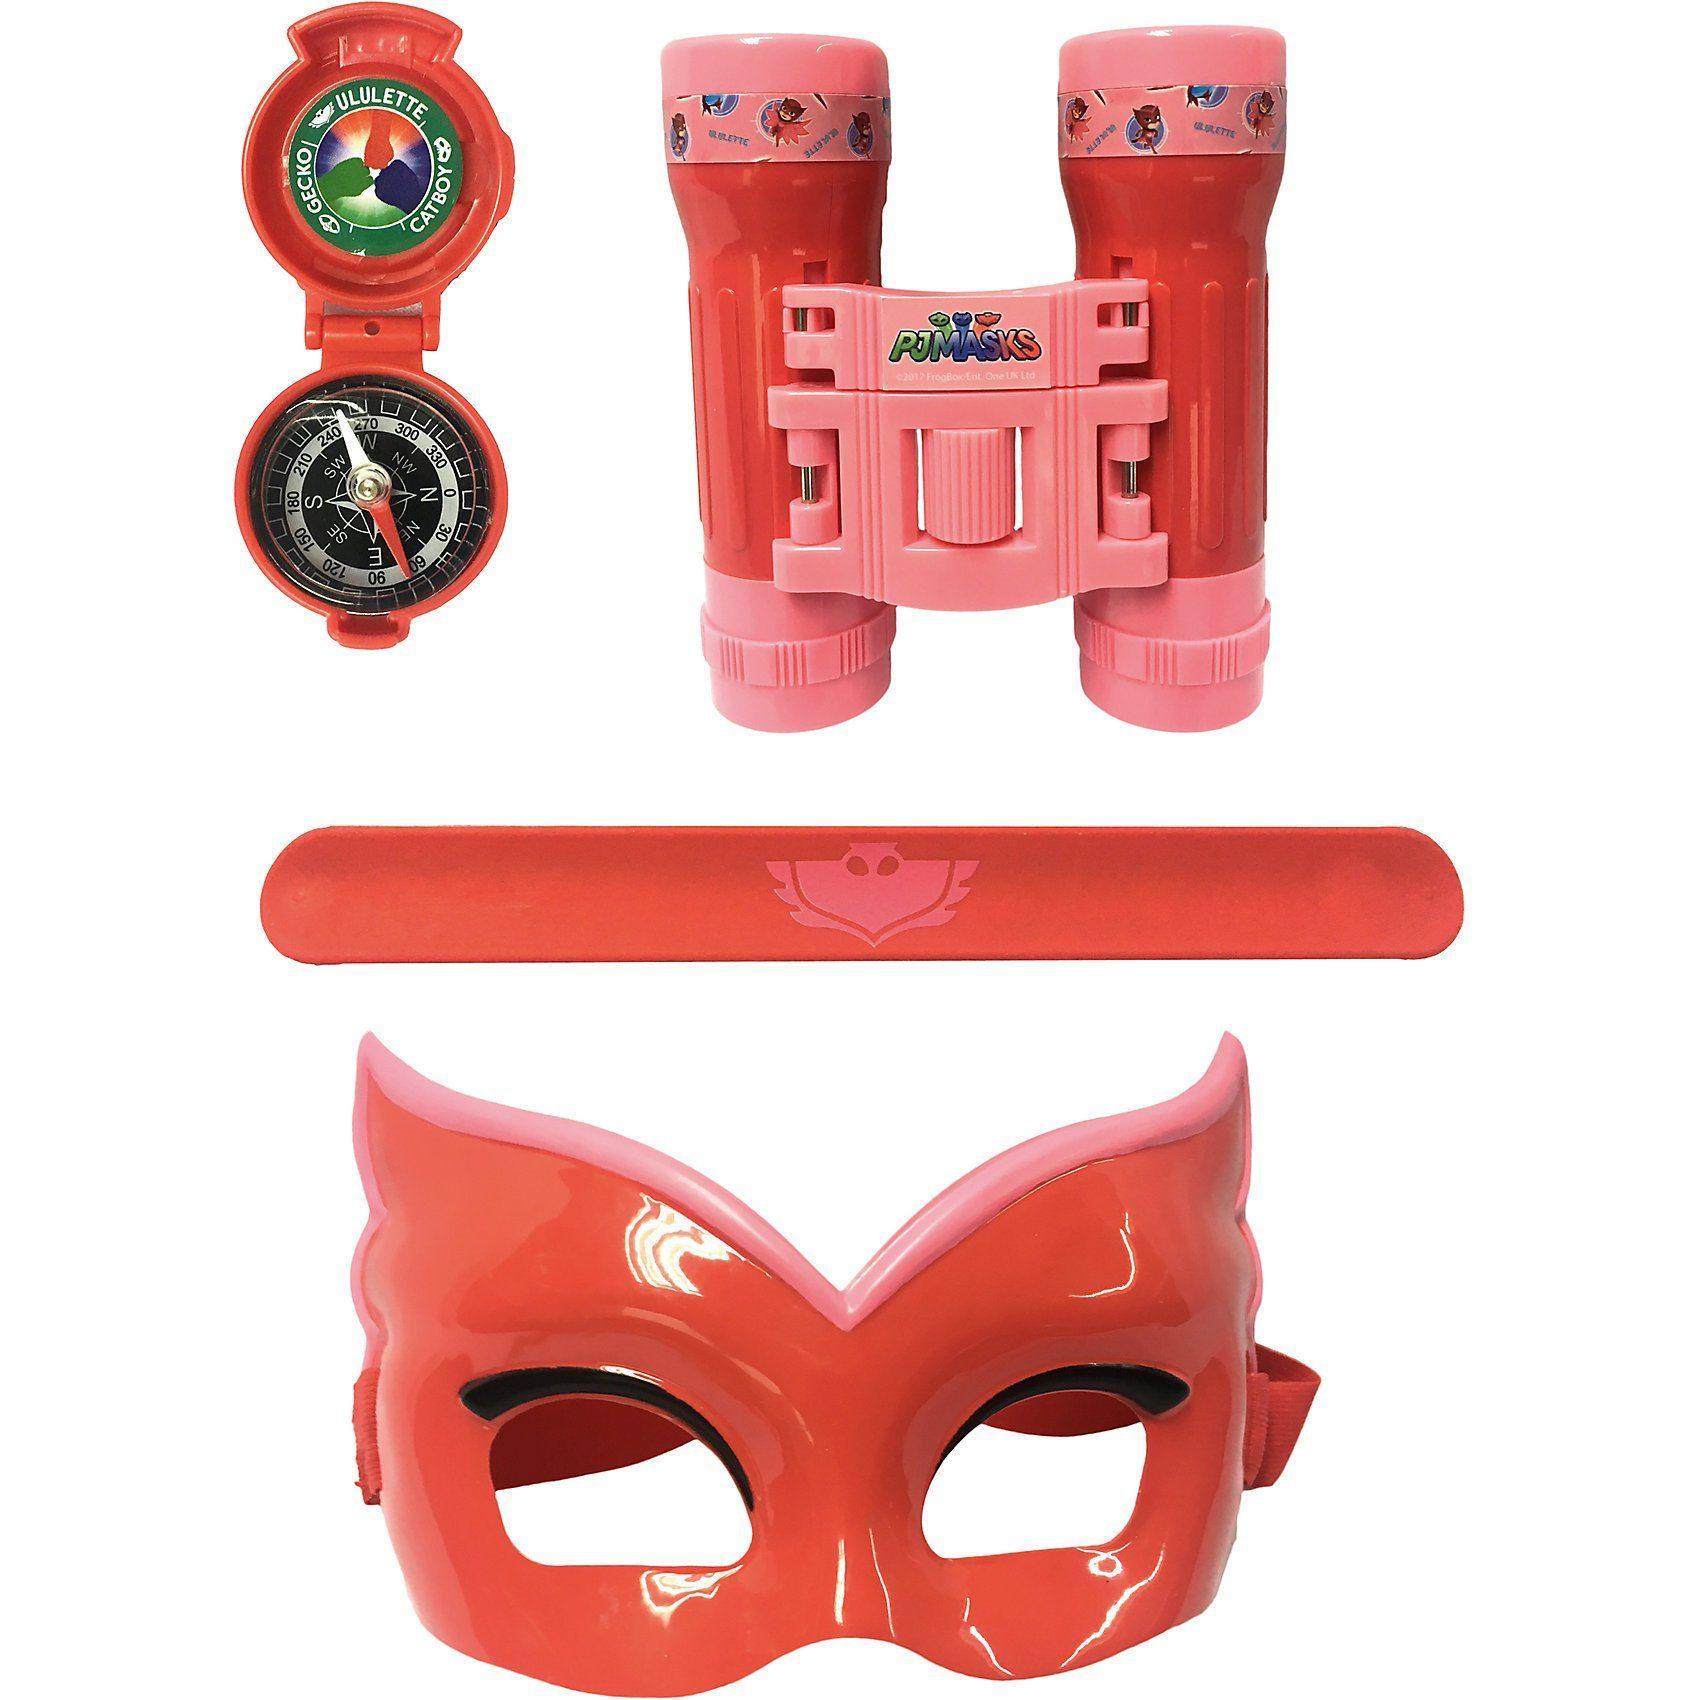 Joy Toy PJ Masks Eulette - Adventureset 4 teilig